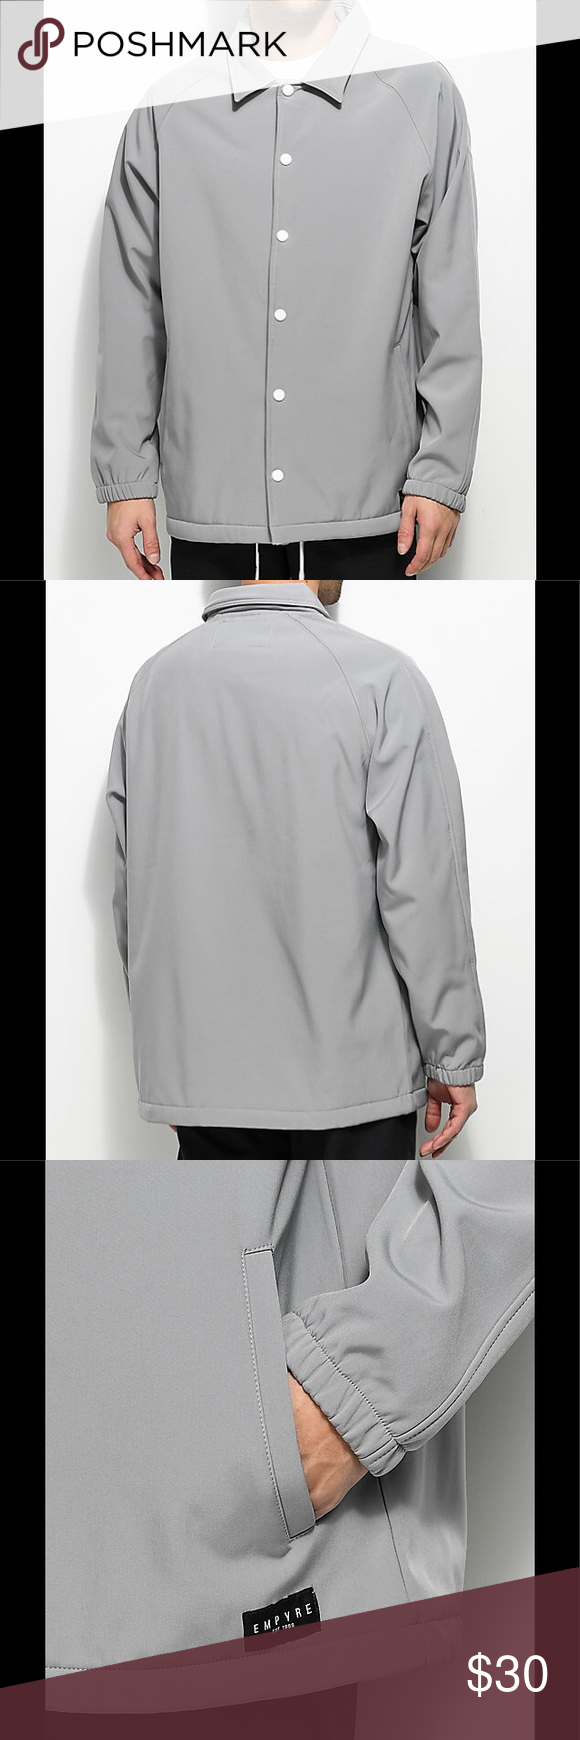 sold empyre light grey tech fleece coache jacket nwt